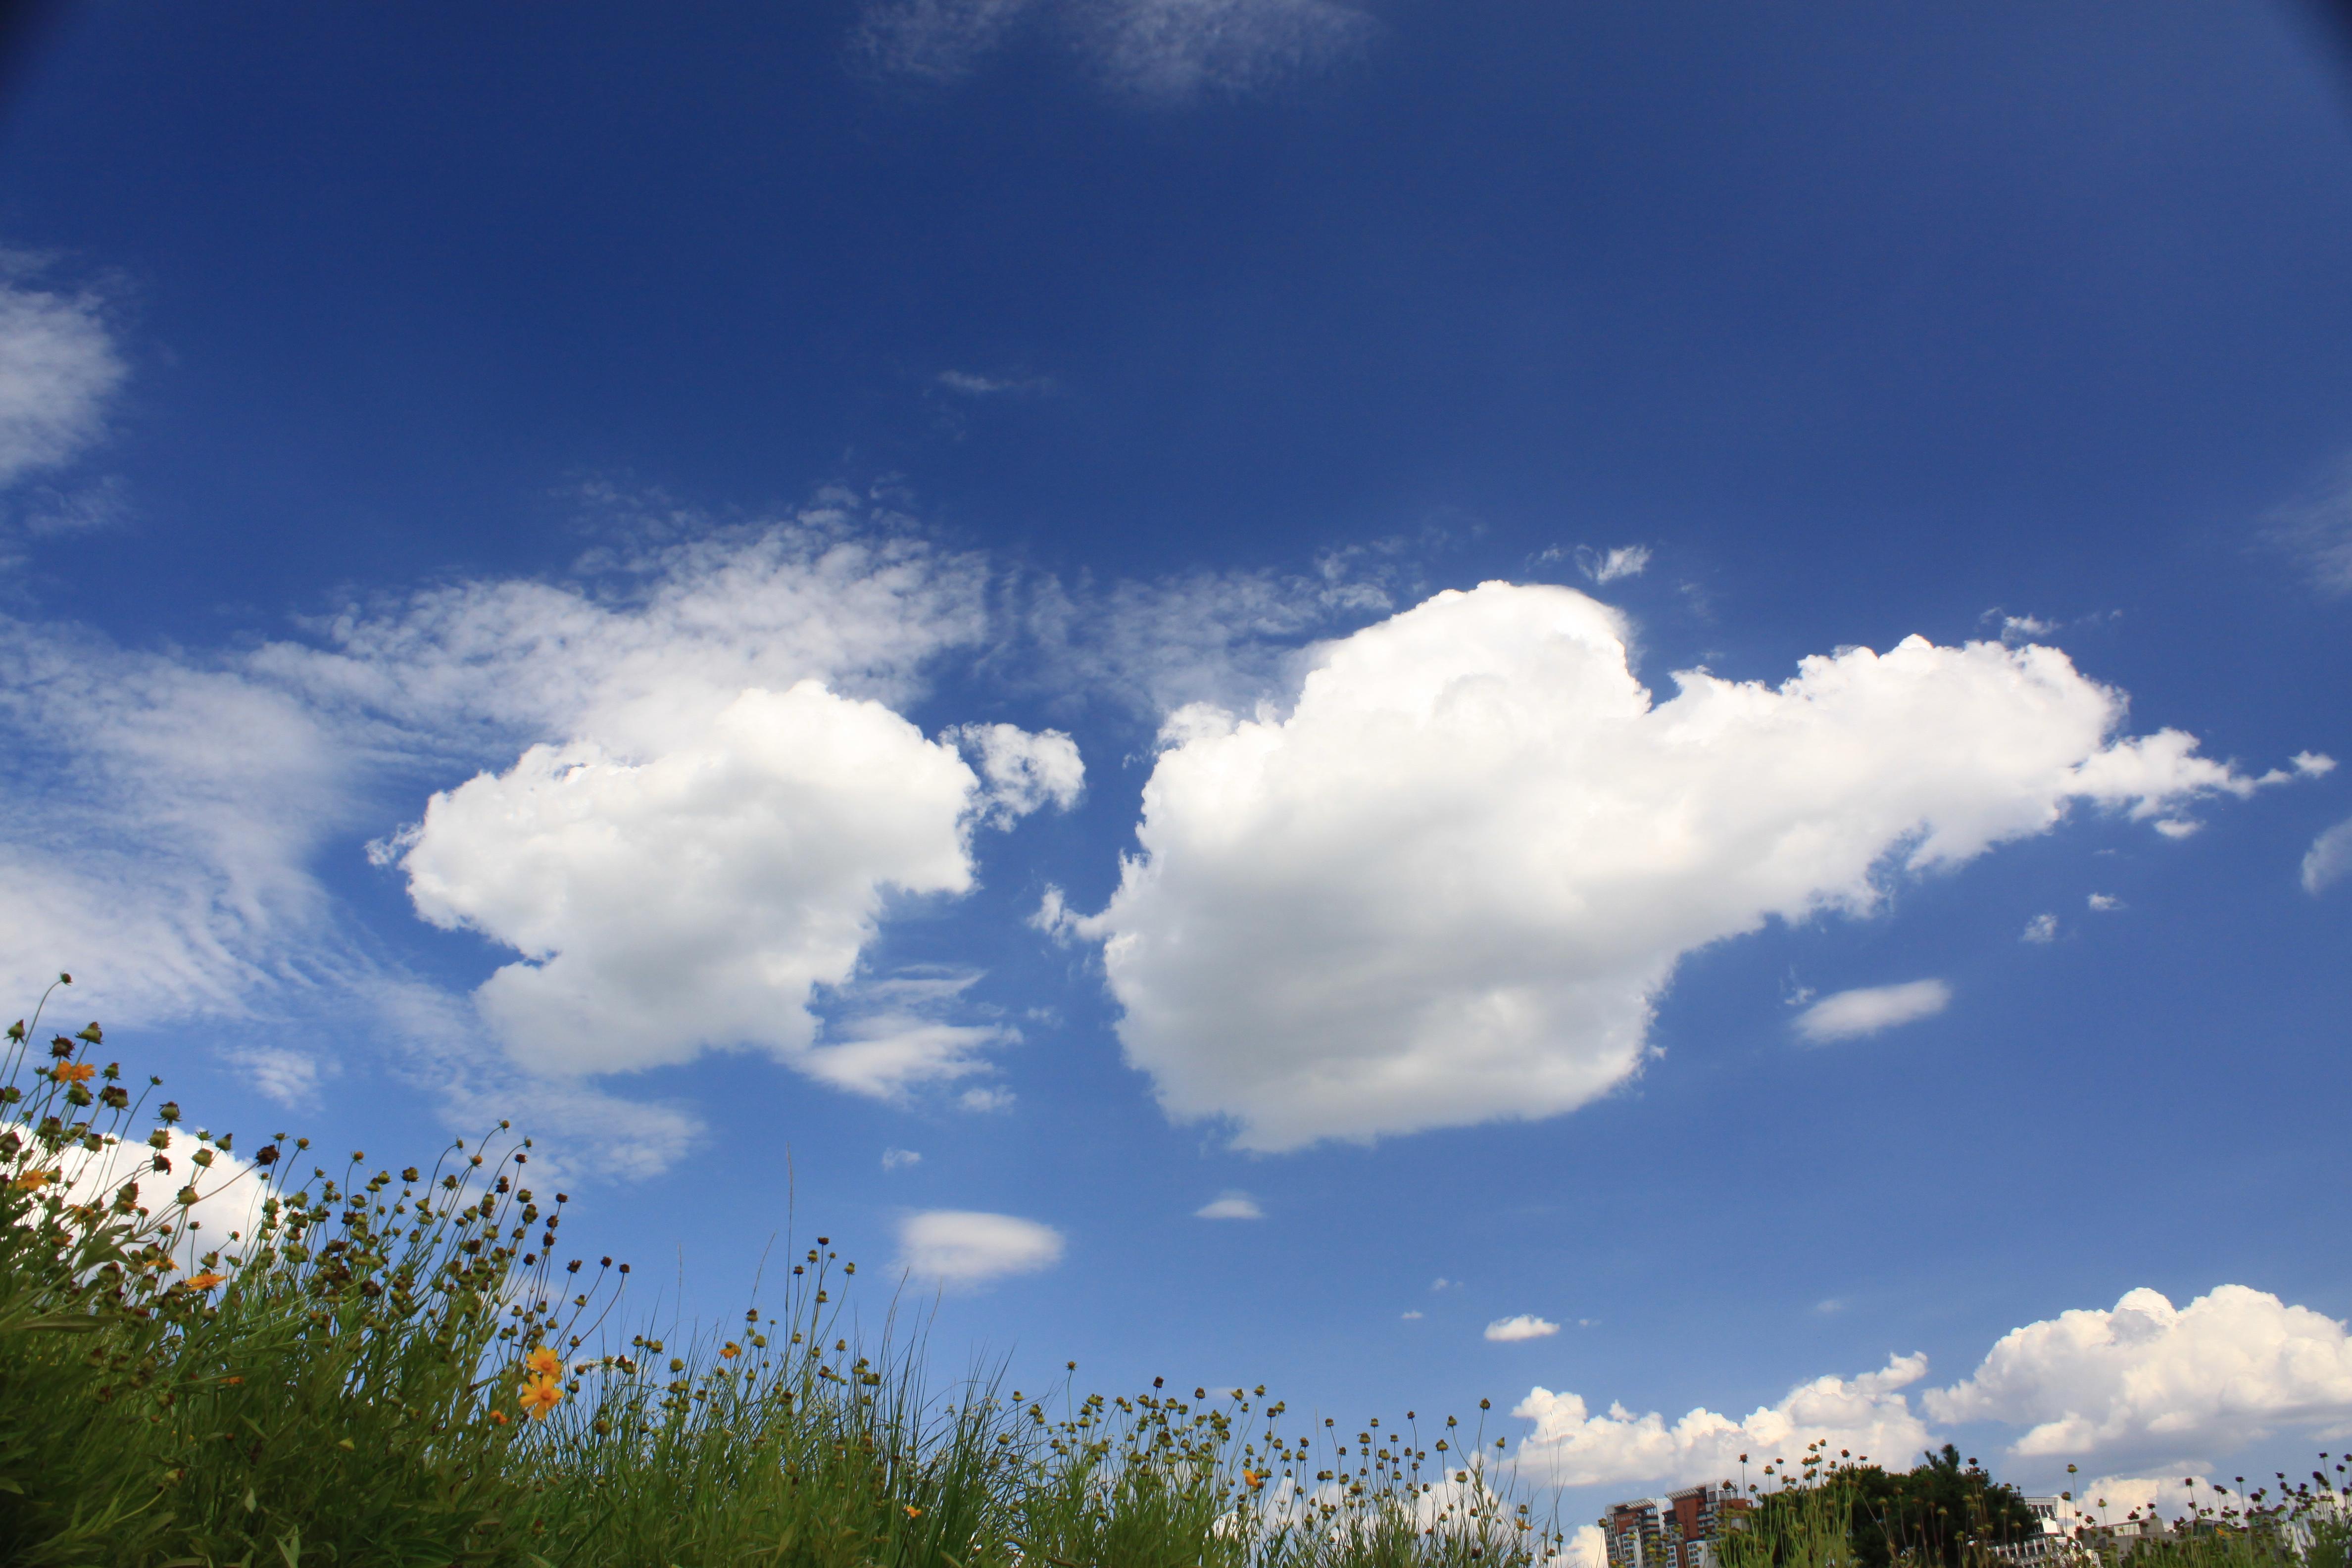 над нами небо голубое картинки мае